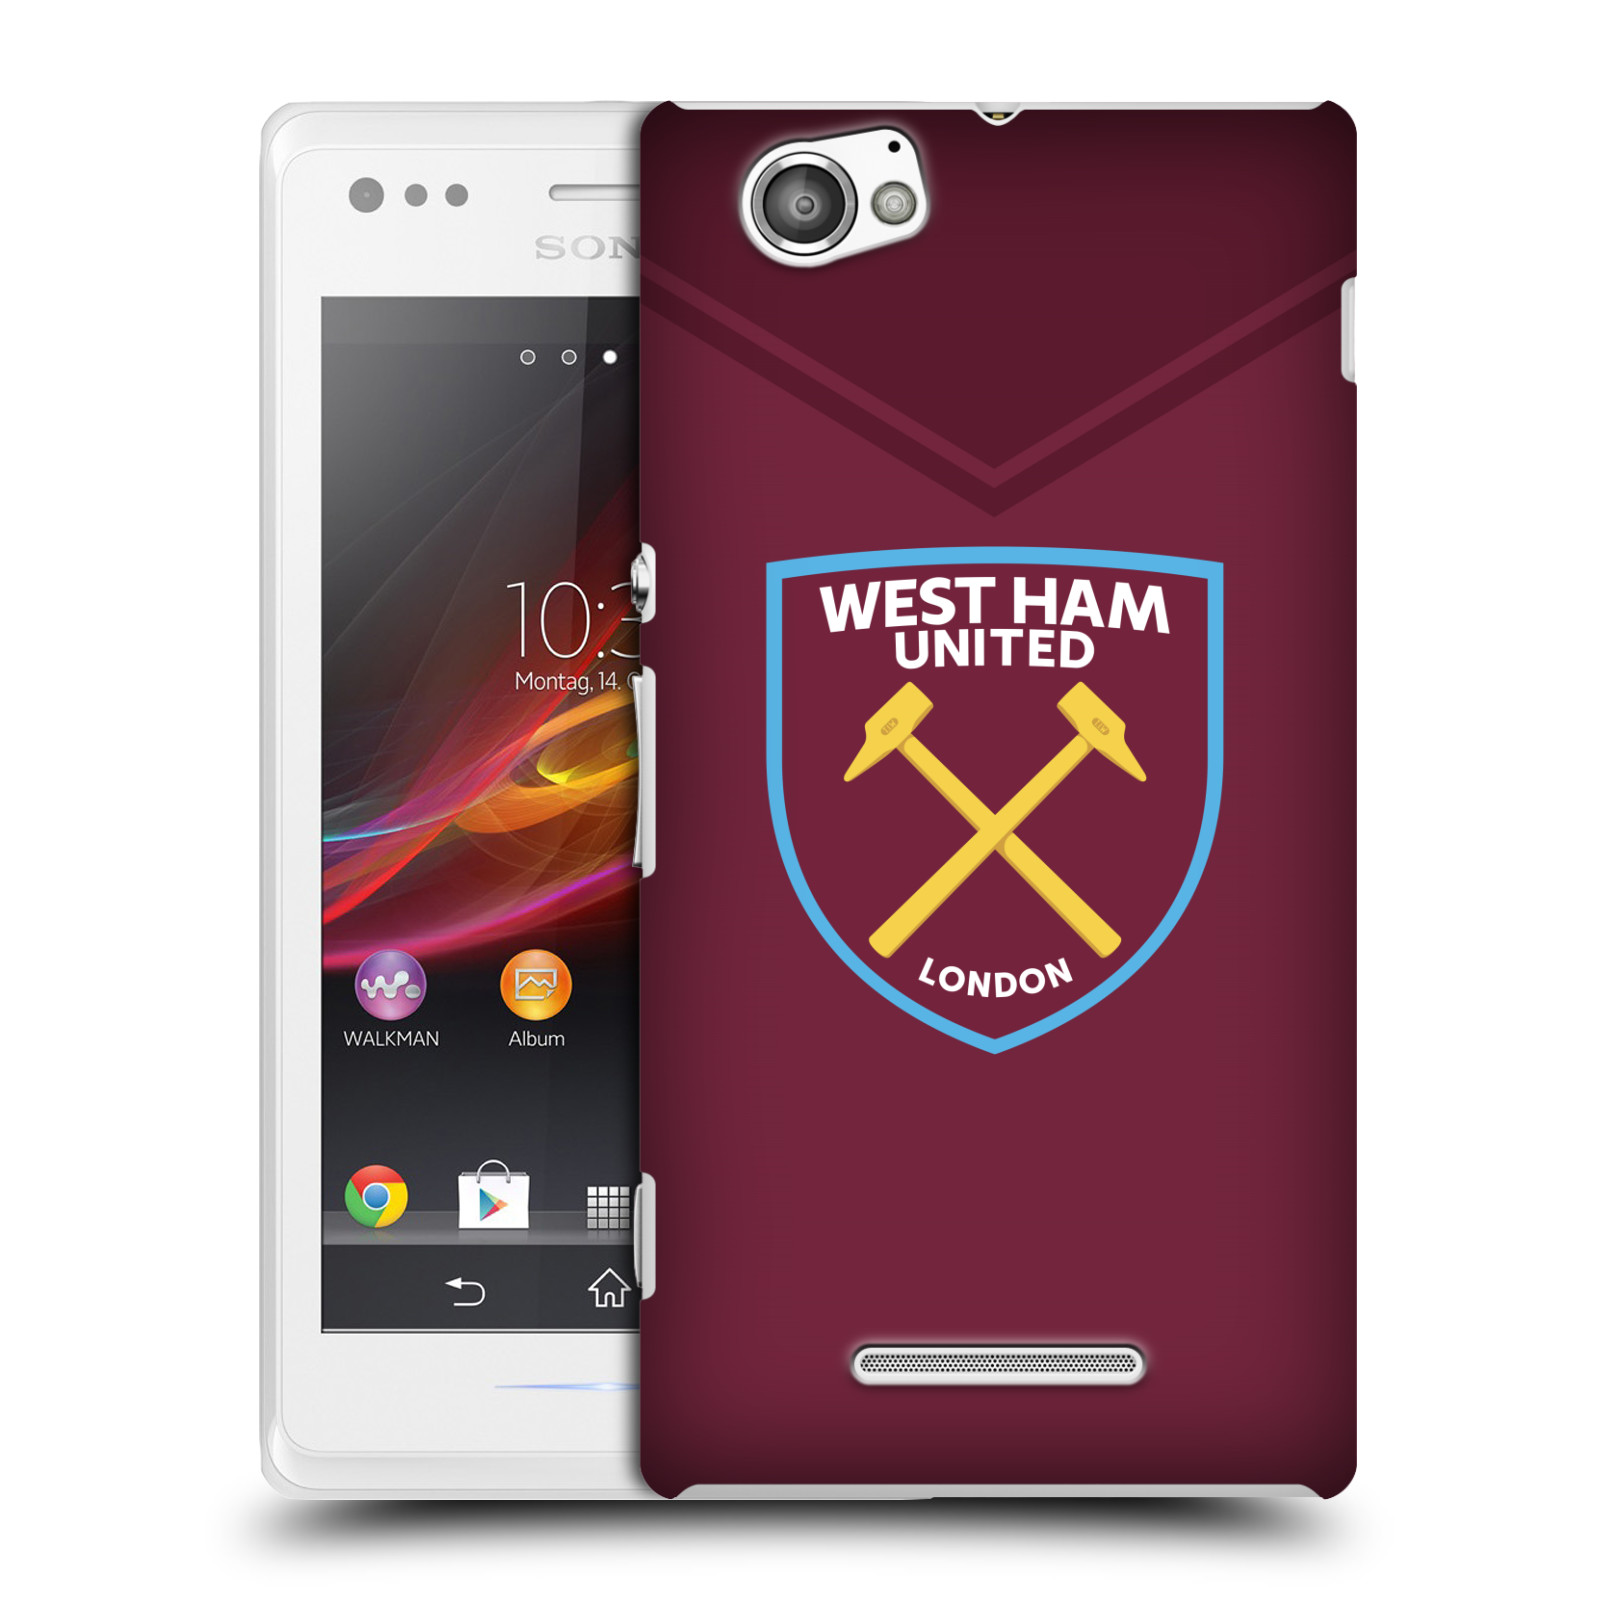 Plastové pouzdro na mobil Sony Xperia M C1905 - Head Case - West Ham United - Logo